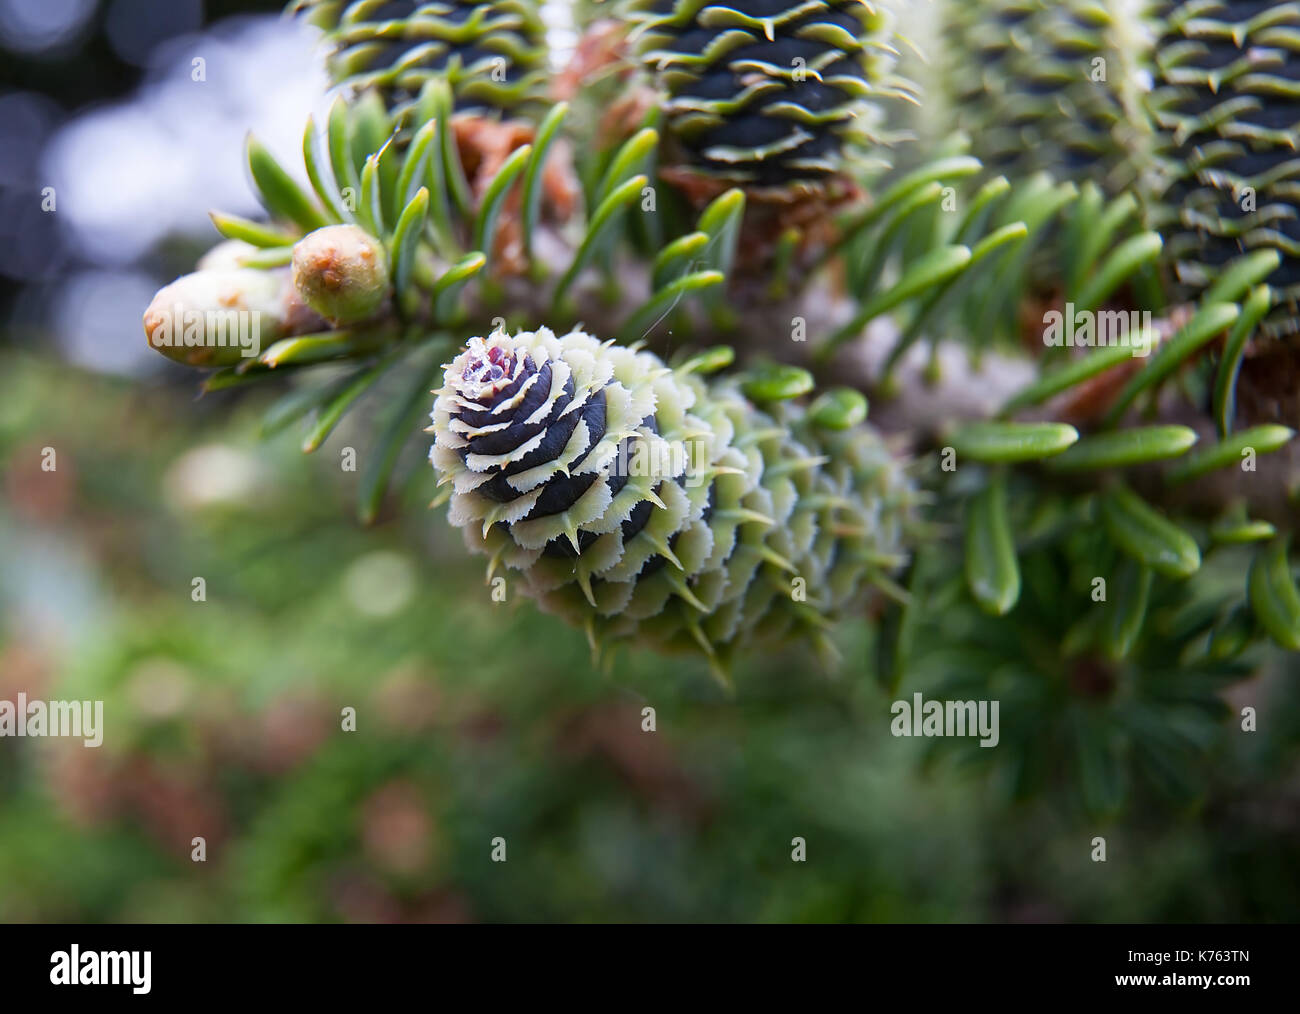 Rare conifers: Korean fir. Cones of the fir. Macro - Stock Image